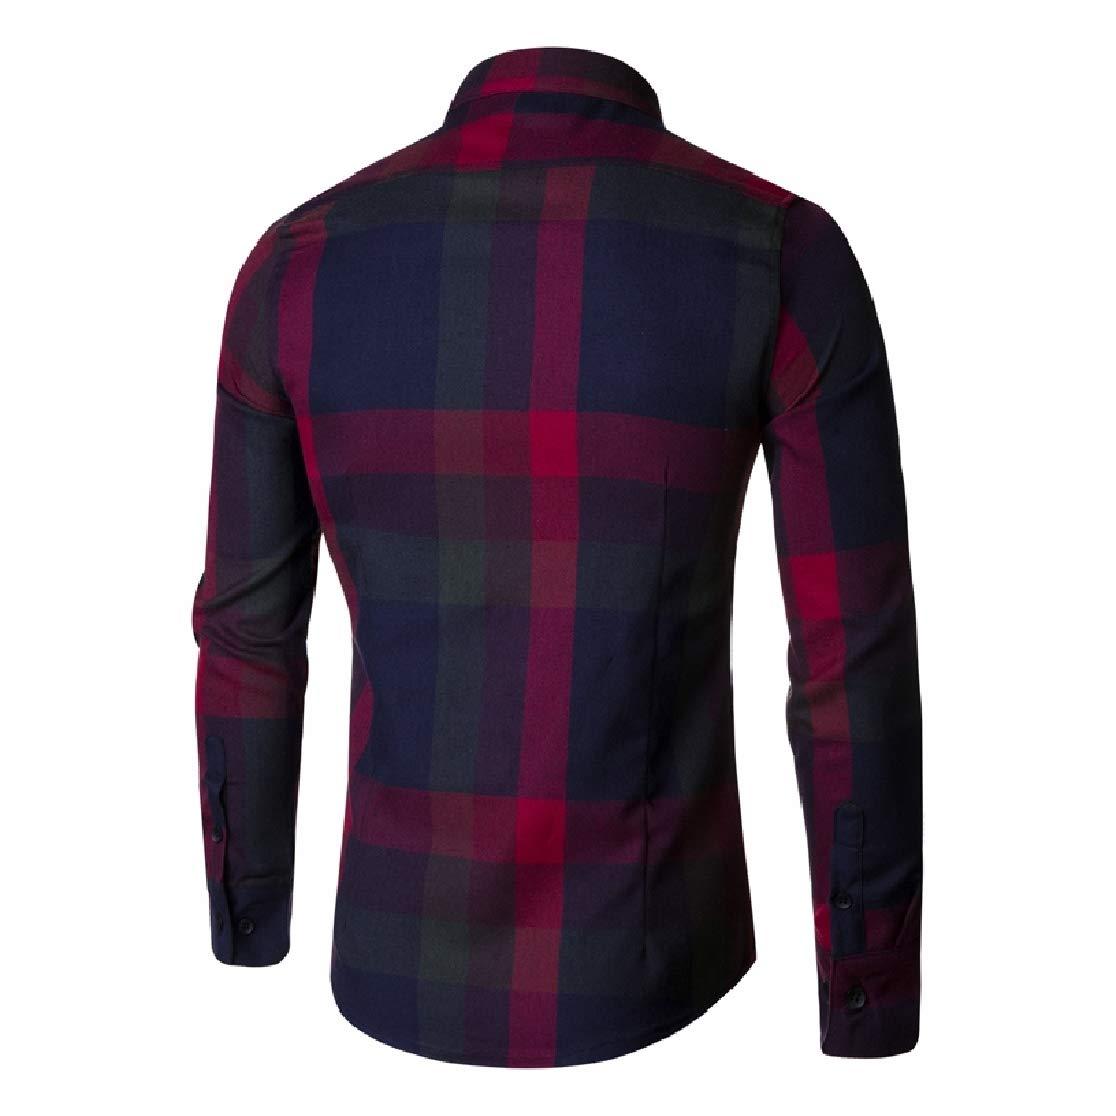 Comaba Mens Plaid Corduroy Oversize Britain Leisure Work Shirt